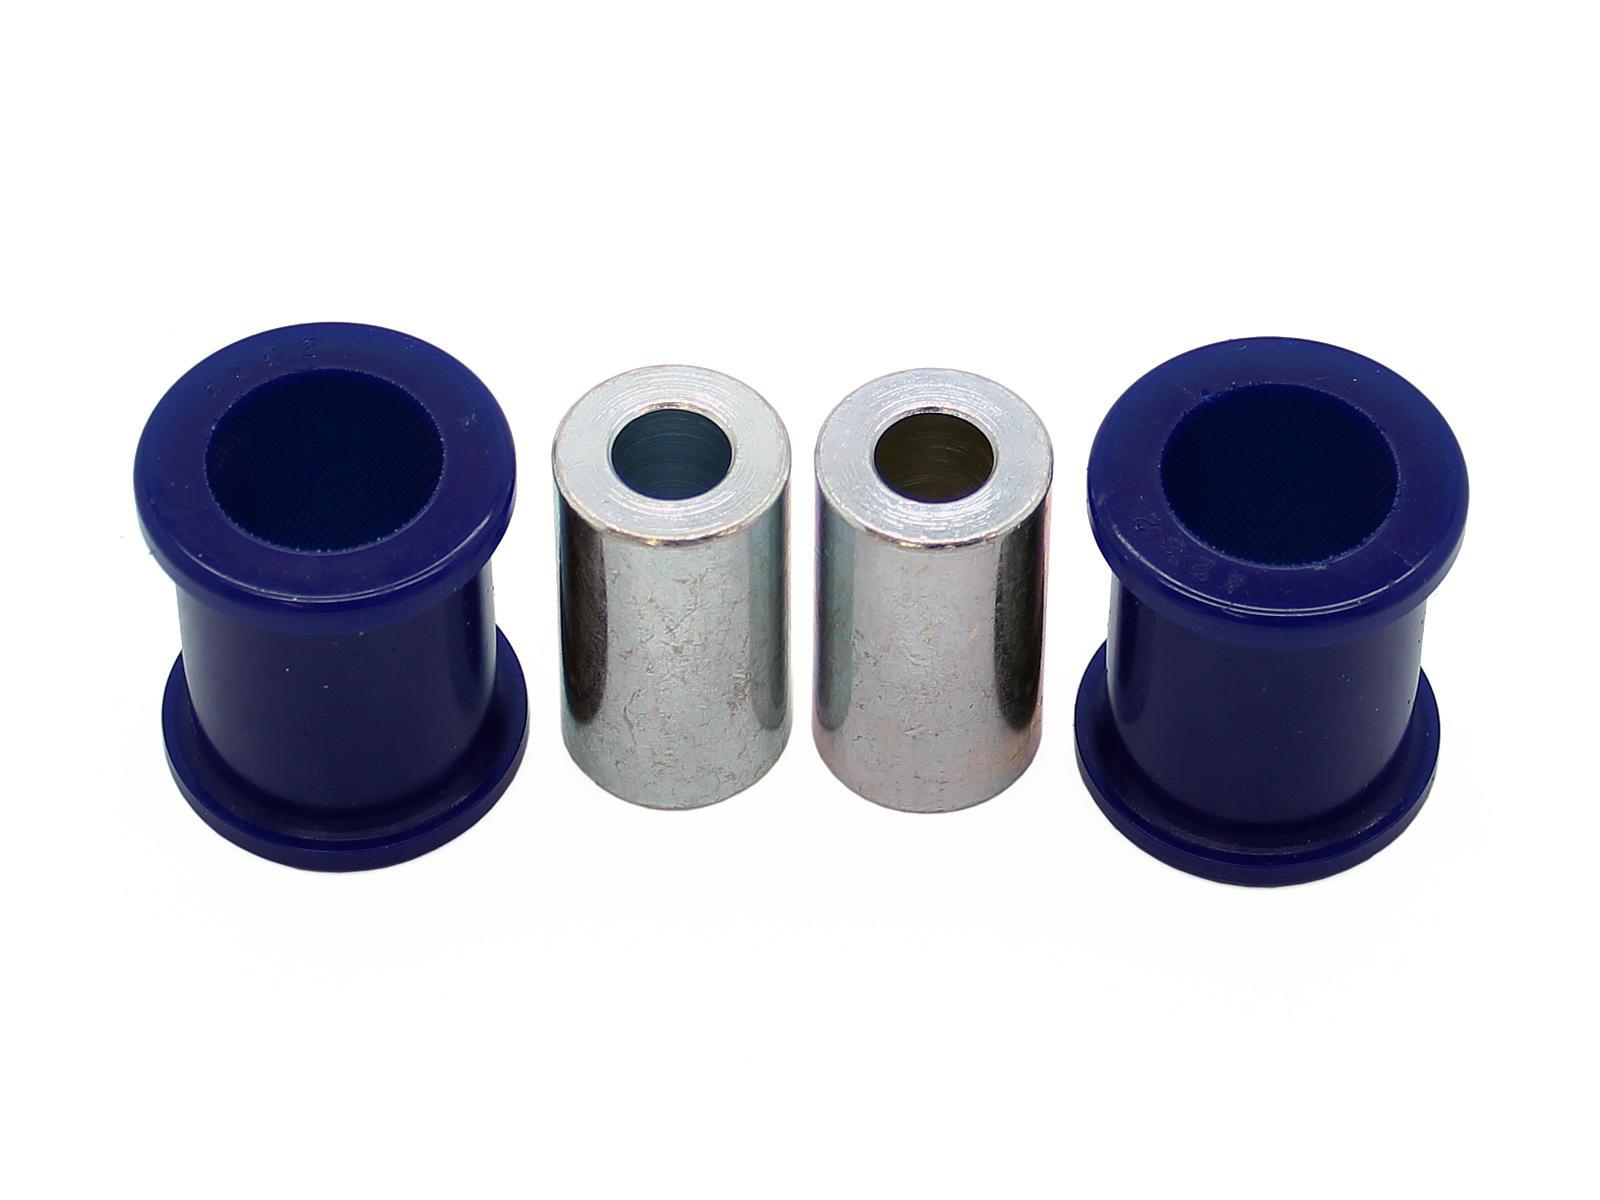 Polyurethane Bushing Kits